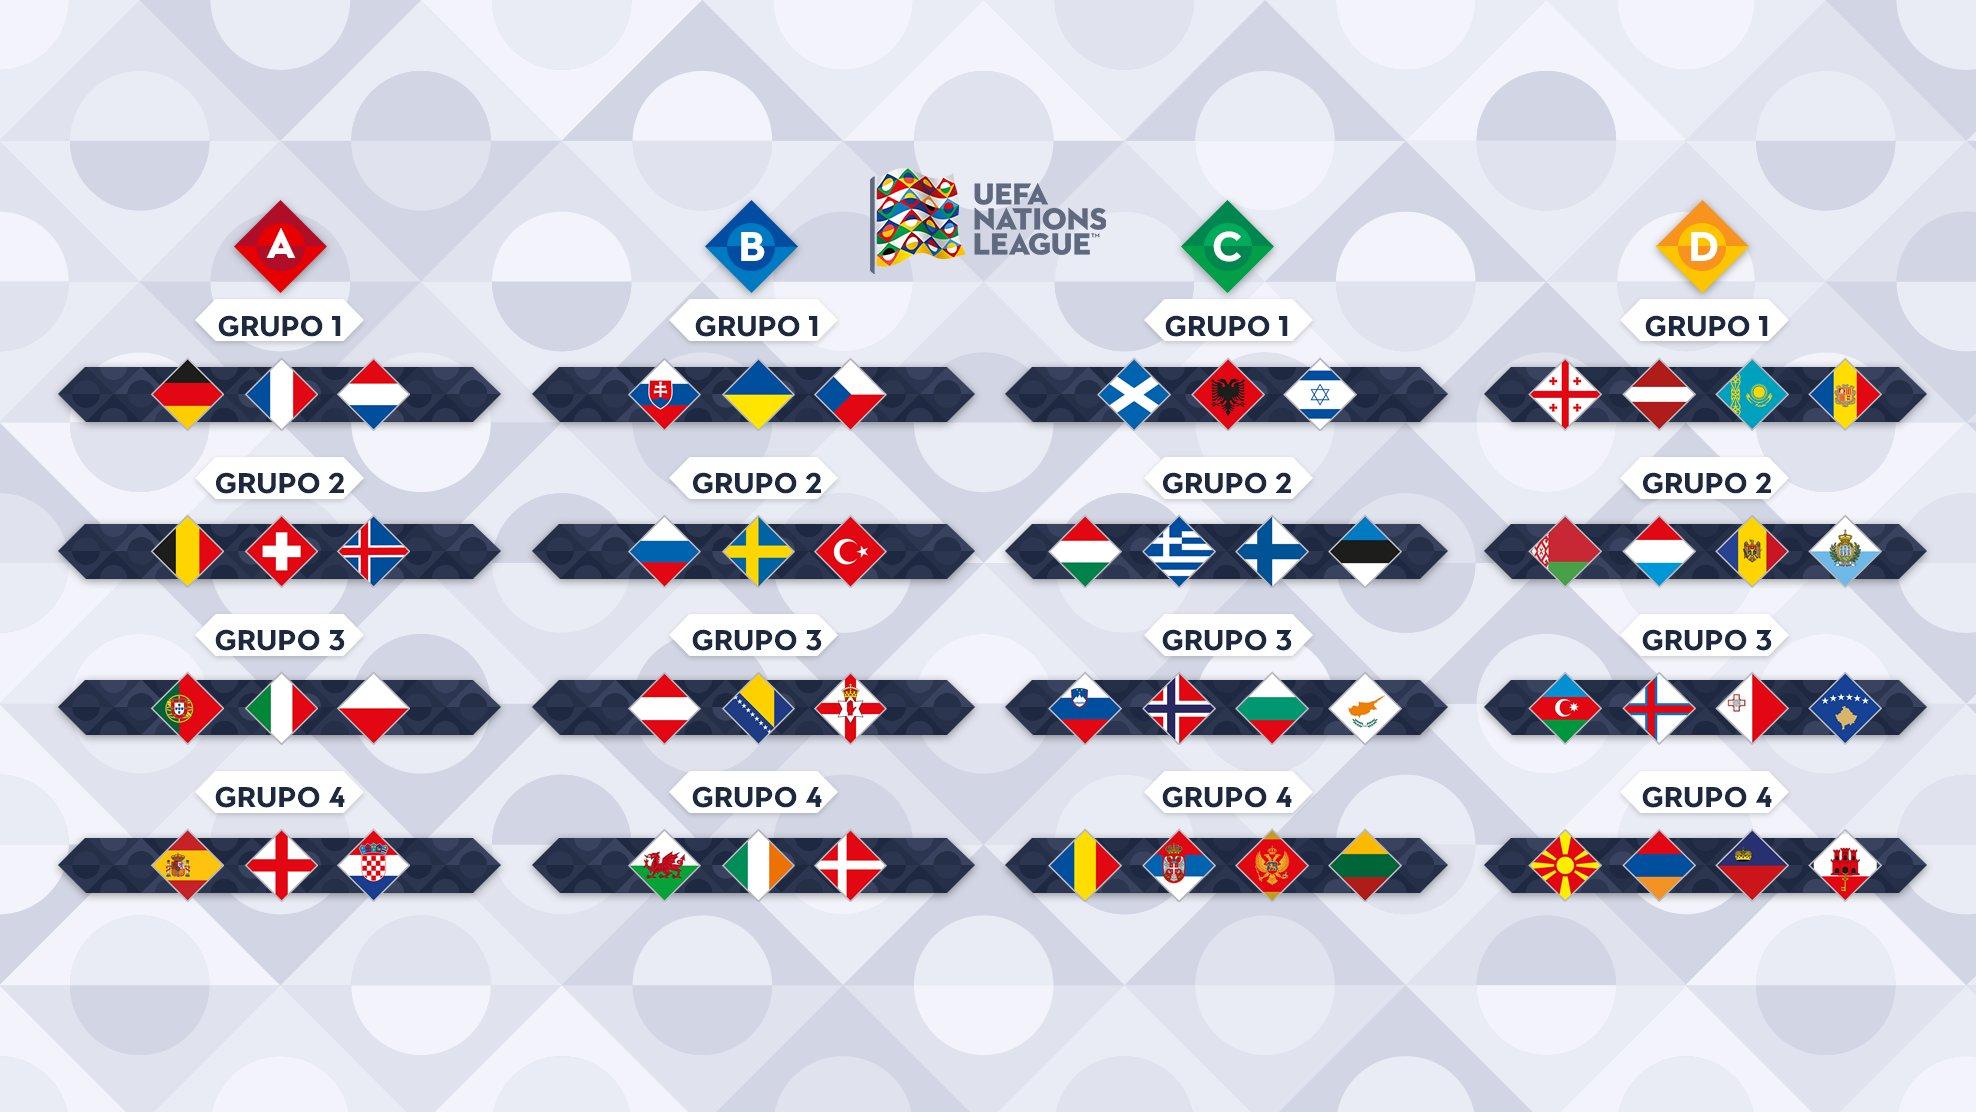 Calendario Partite Italia.Nations League 2019 Calendario E Dirette Tv Delle Partite